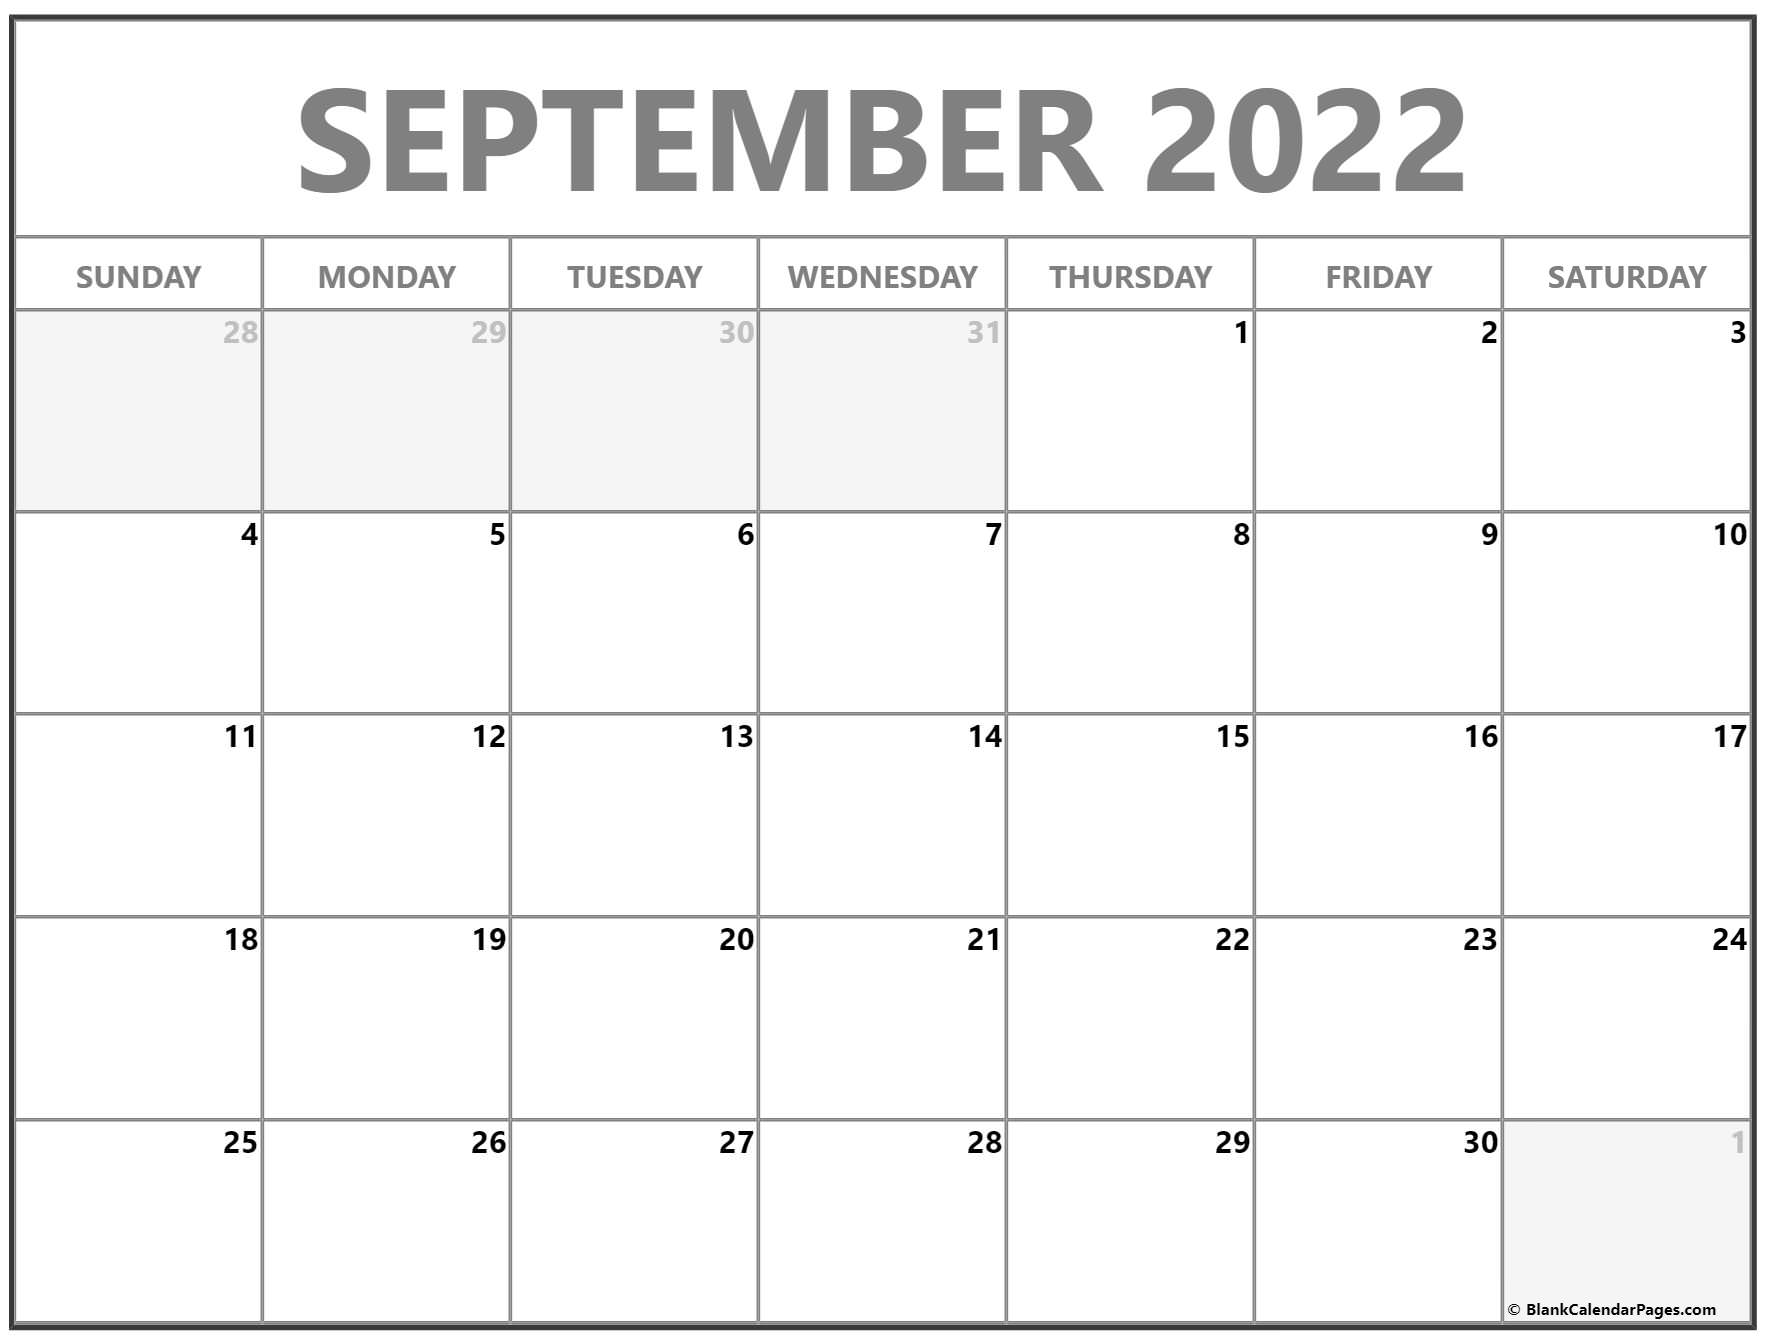 September 2022 Printable Calendar With Holidays ...